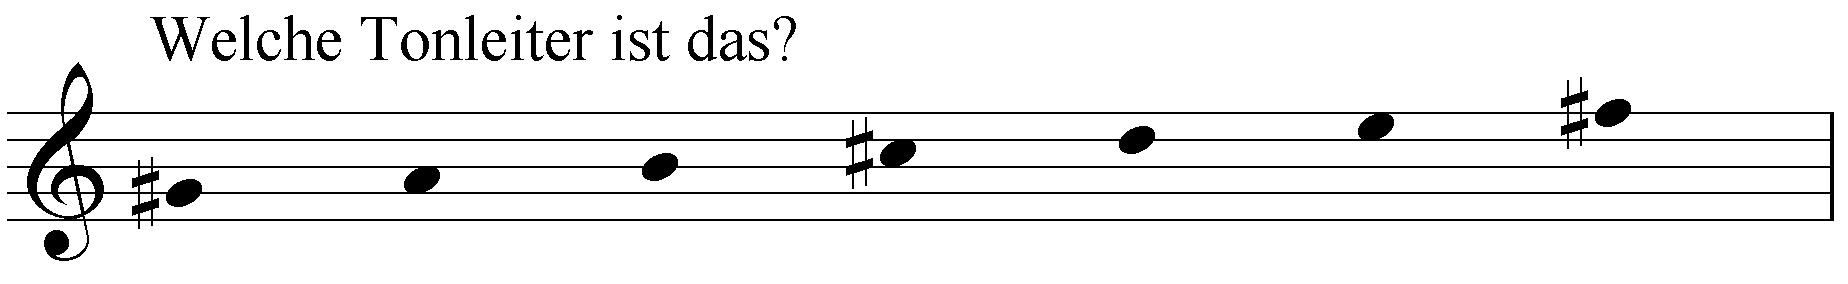 Welche Tonleiter ist das: gis a h cis d e fis?